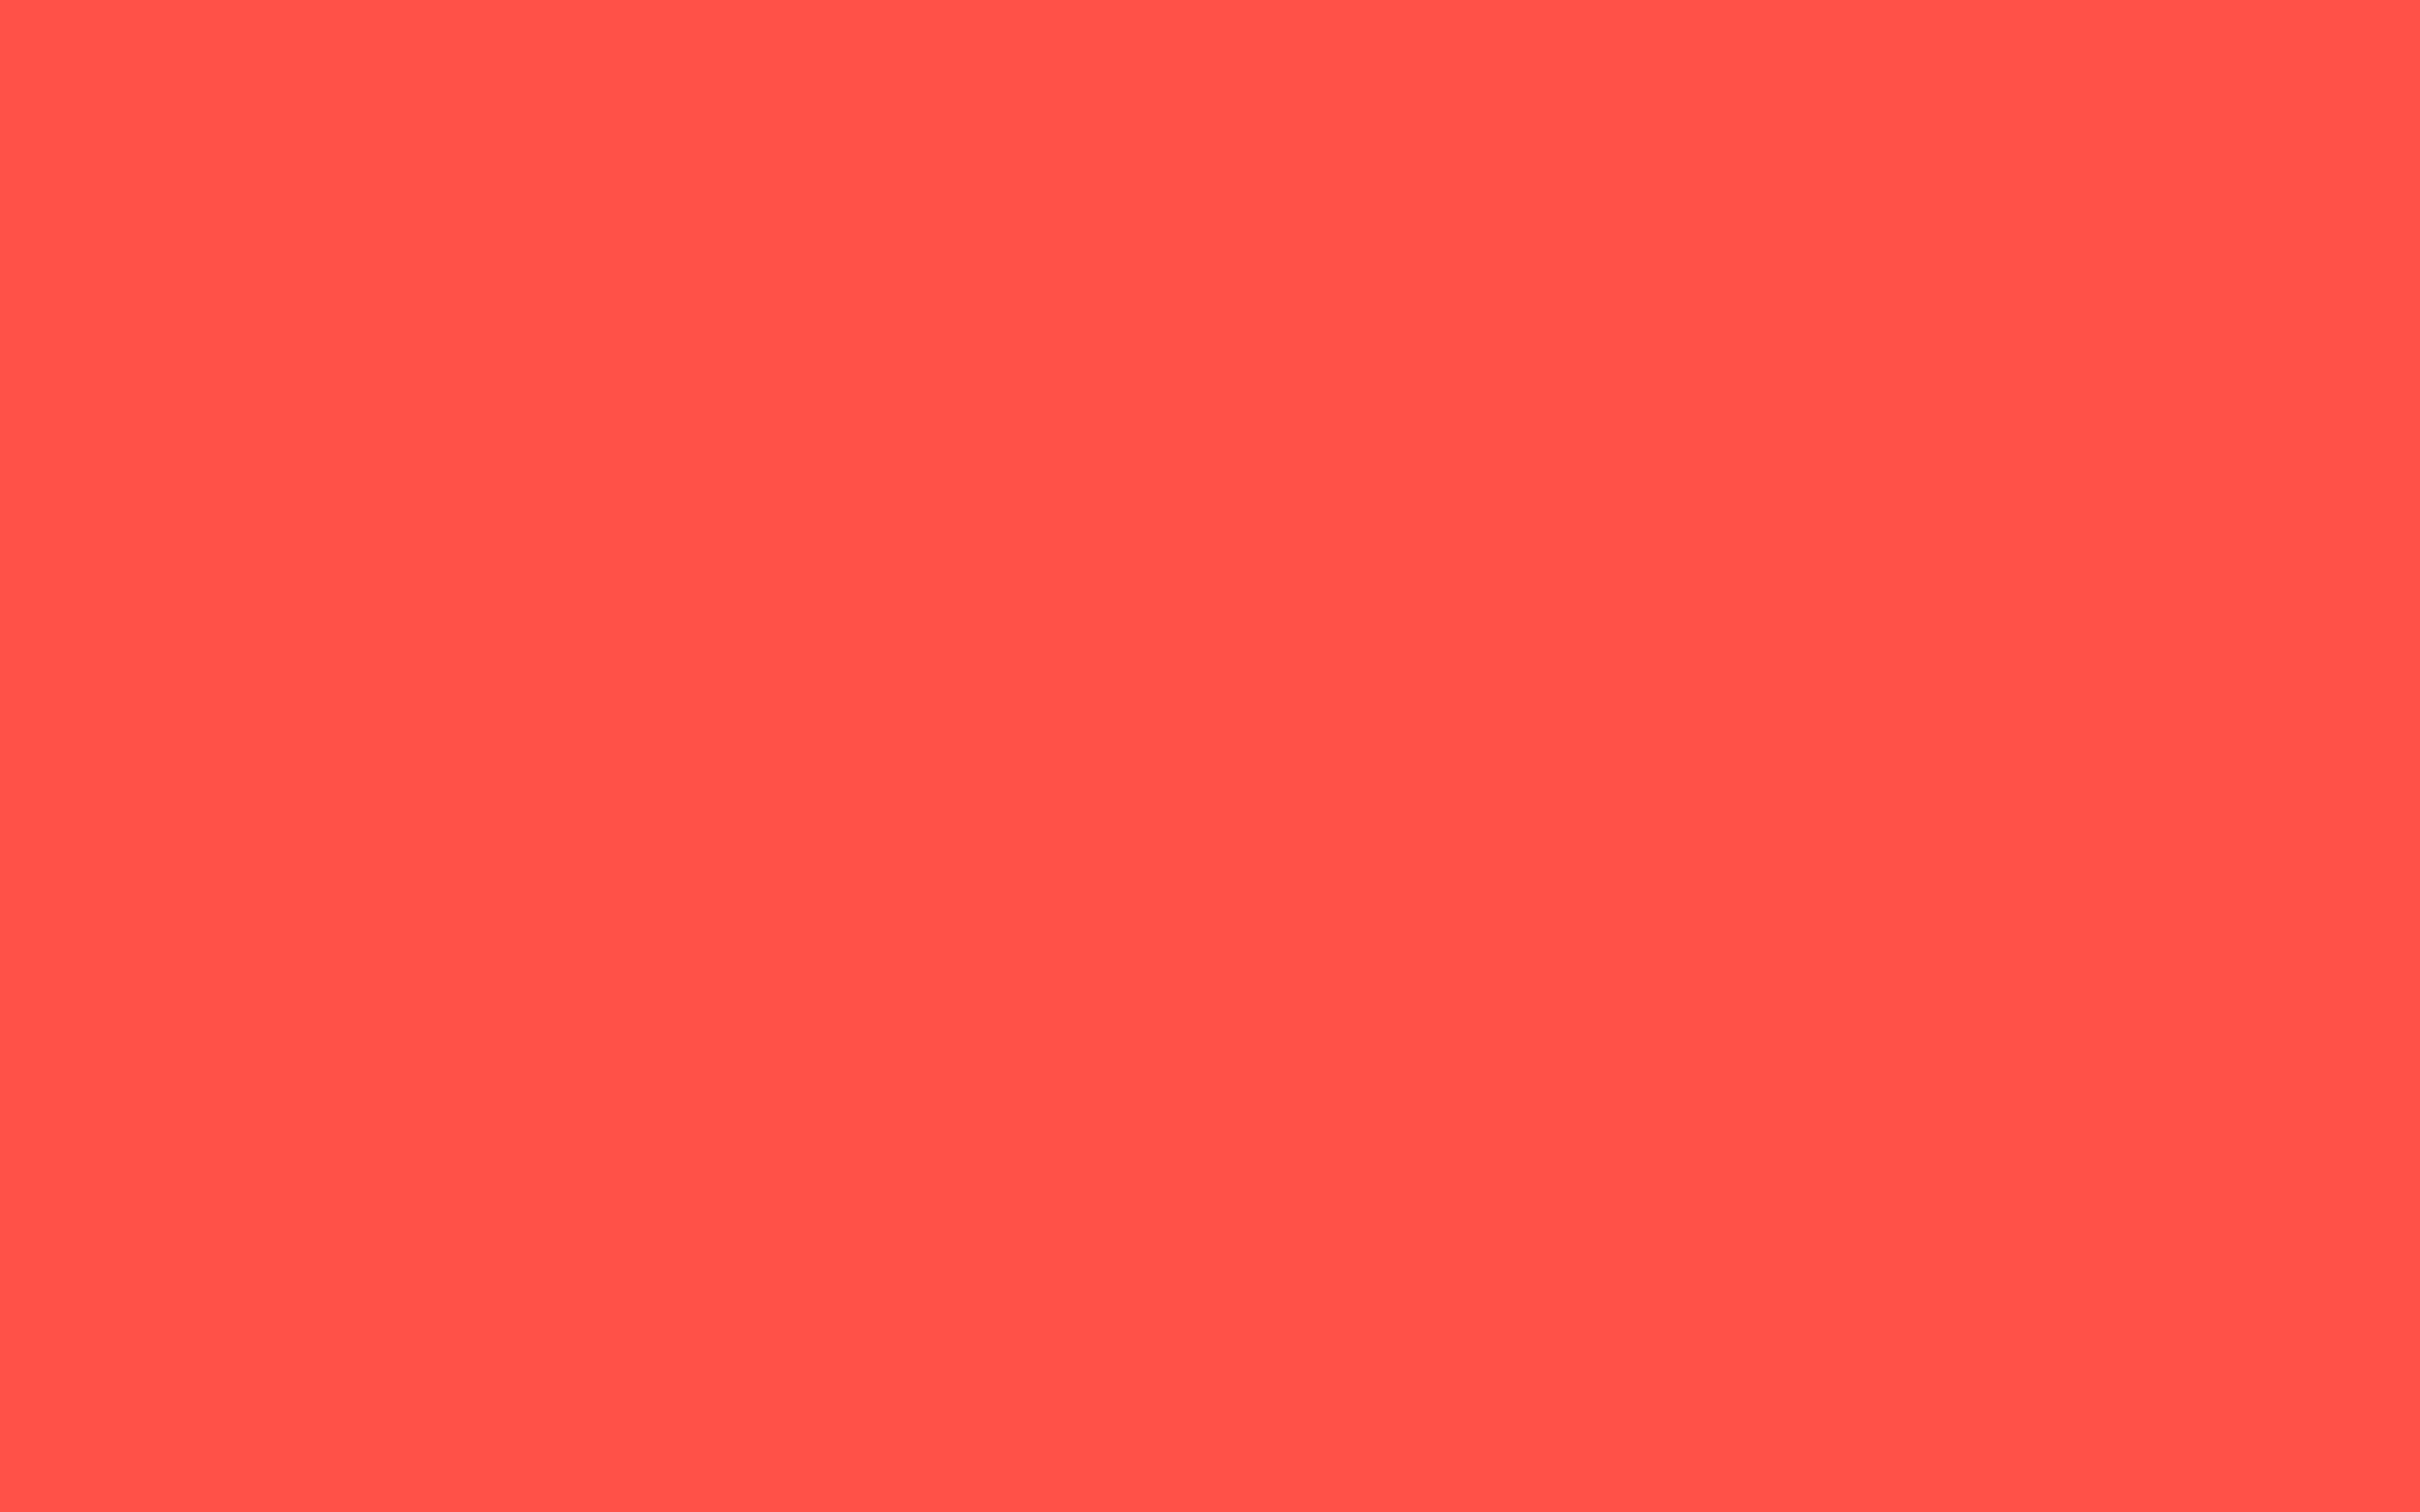 2560x1600 Red-orange Solid Color Background